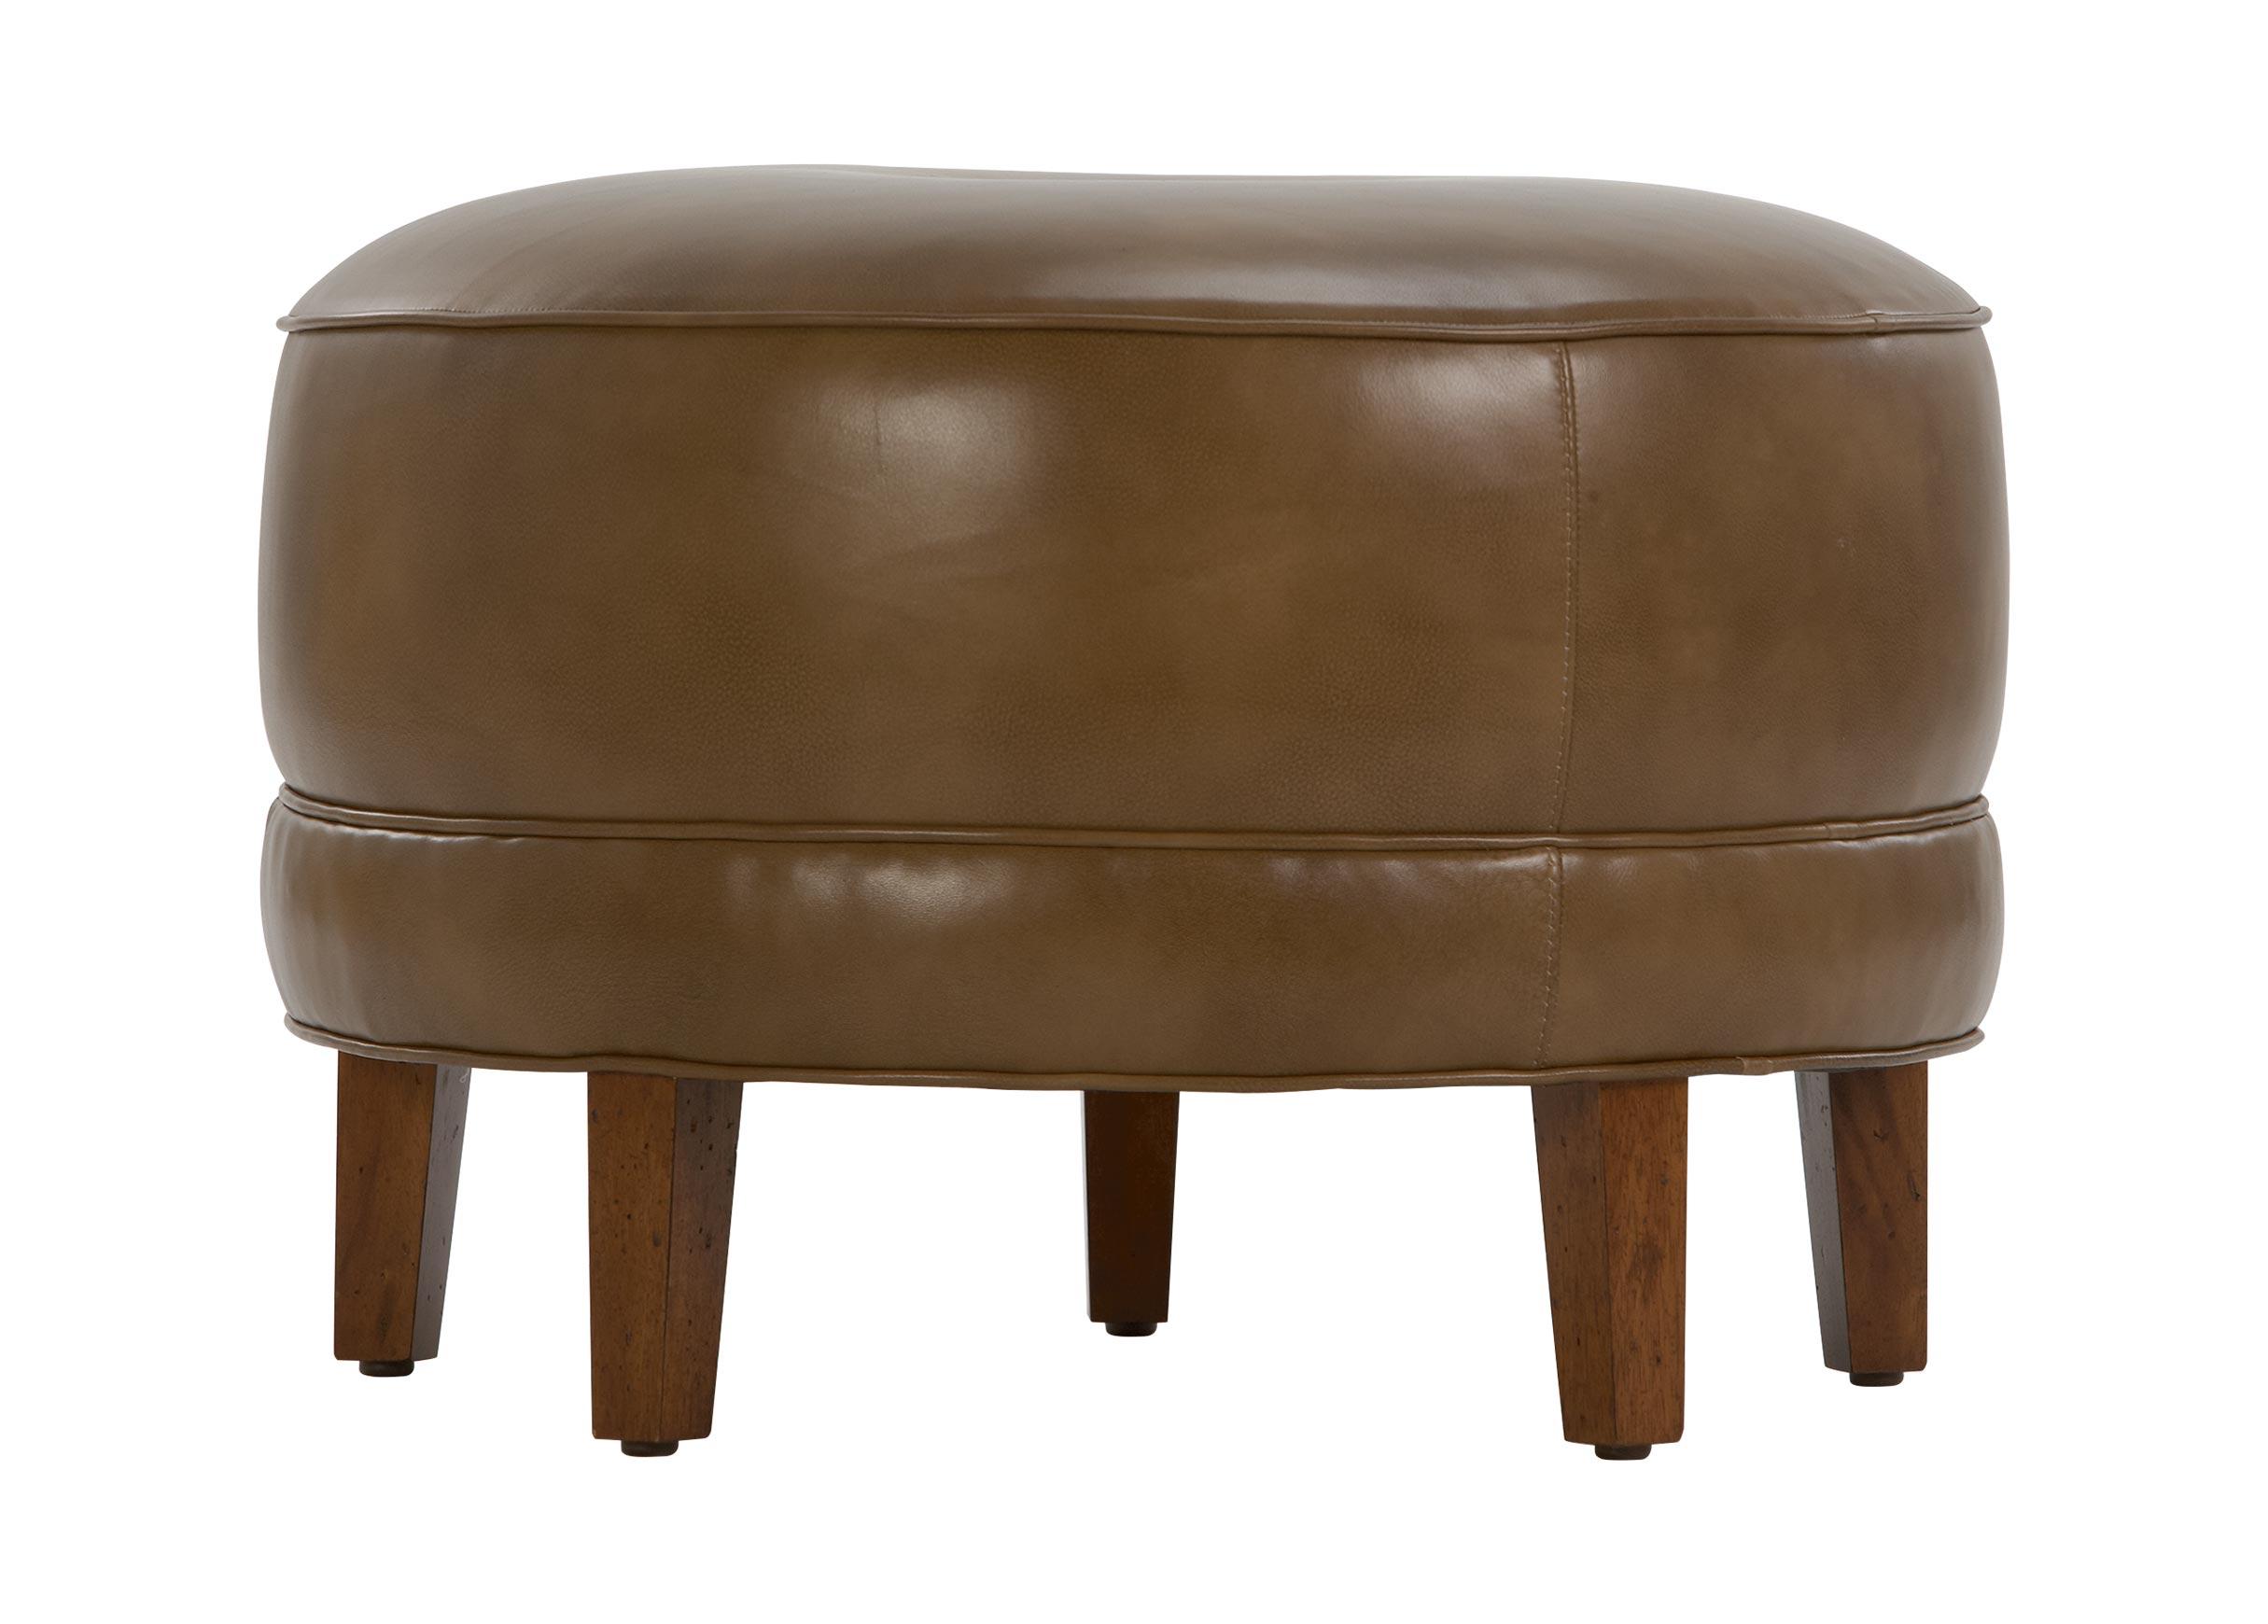 images nassau round leather ottomans largegray